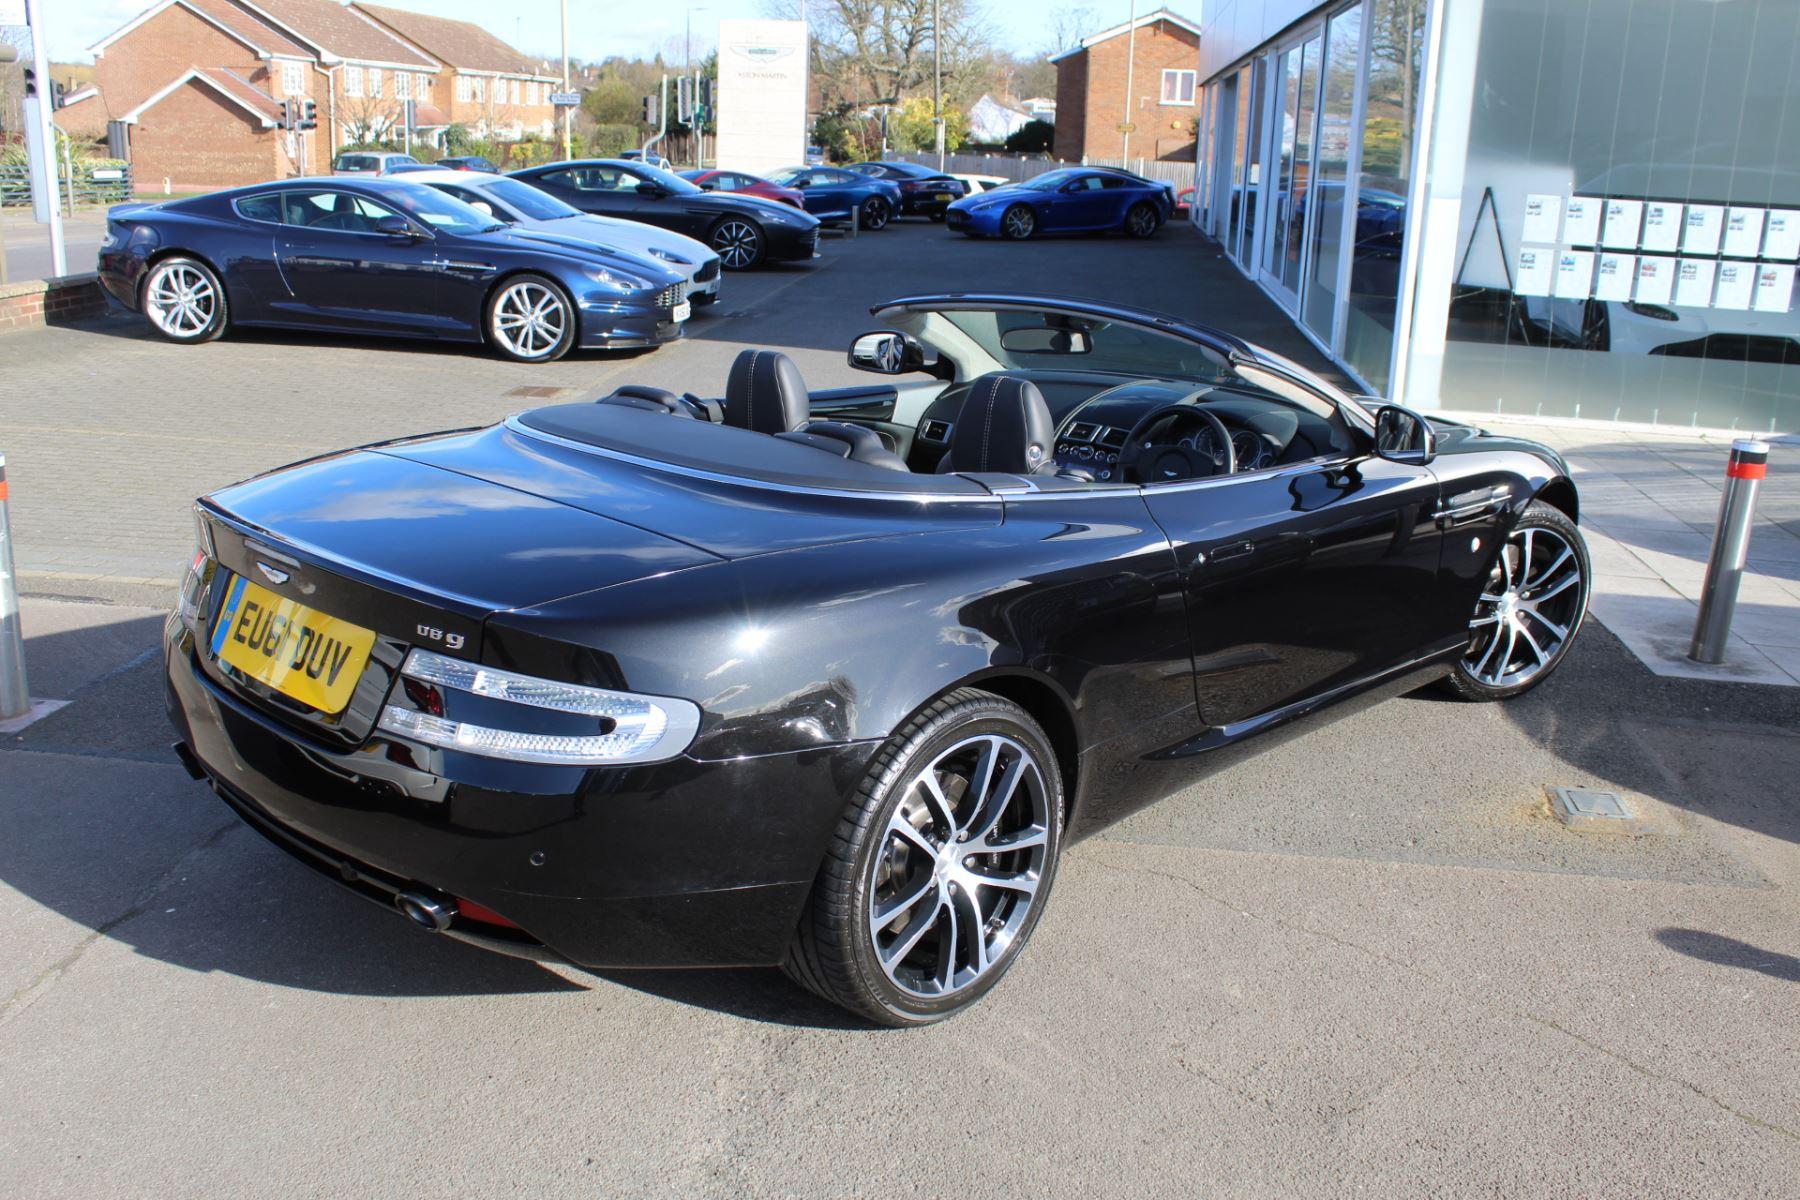 Aston Martin DB9 V12 2dr Volante Touchtronic [470] image 16